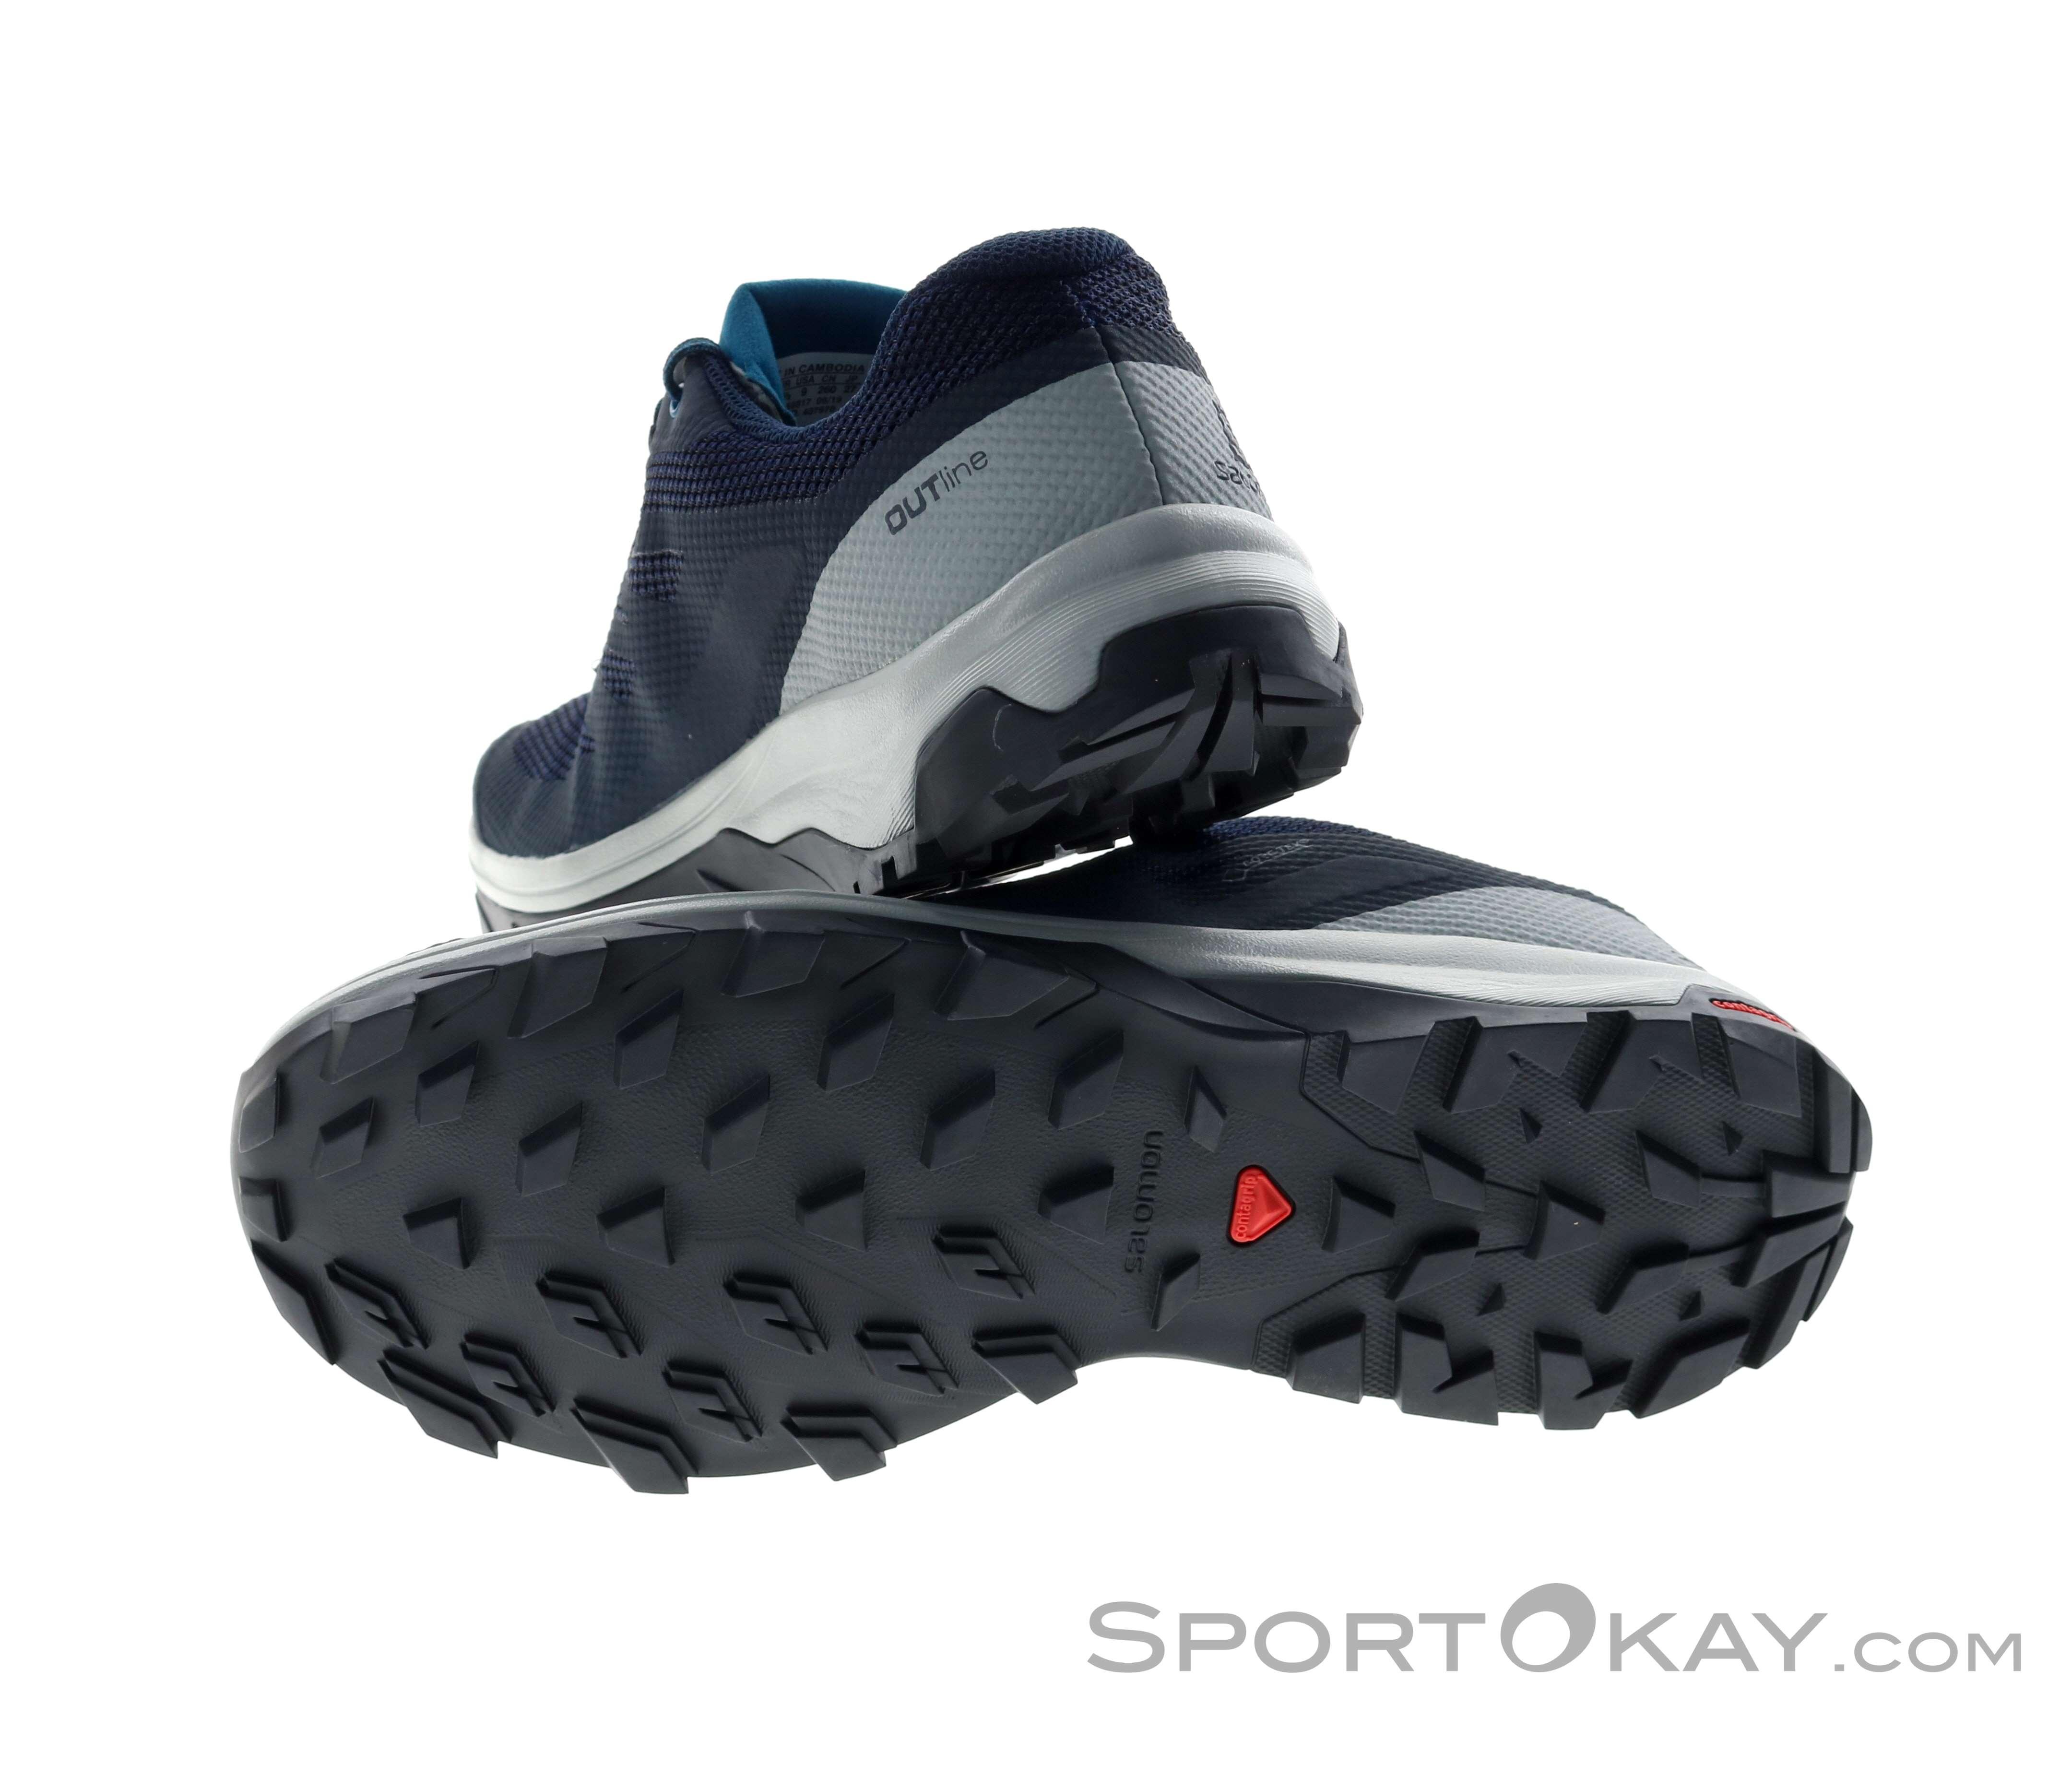 Salomon Salomon Outline GTX Mens Leisure Shoes Gore Tex